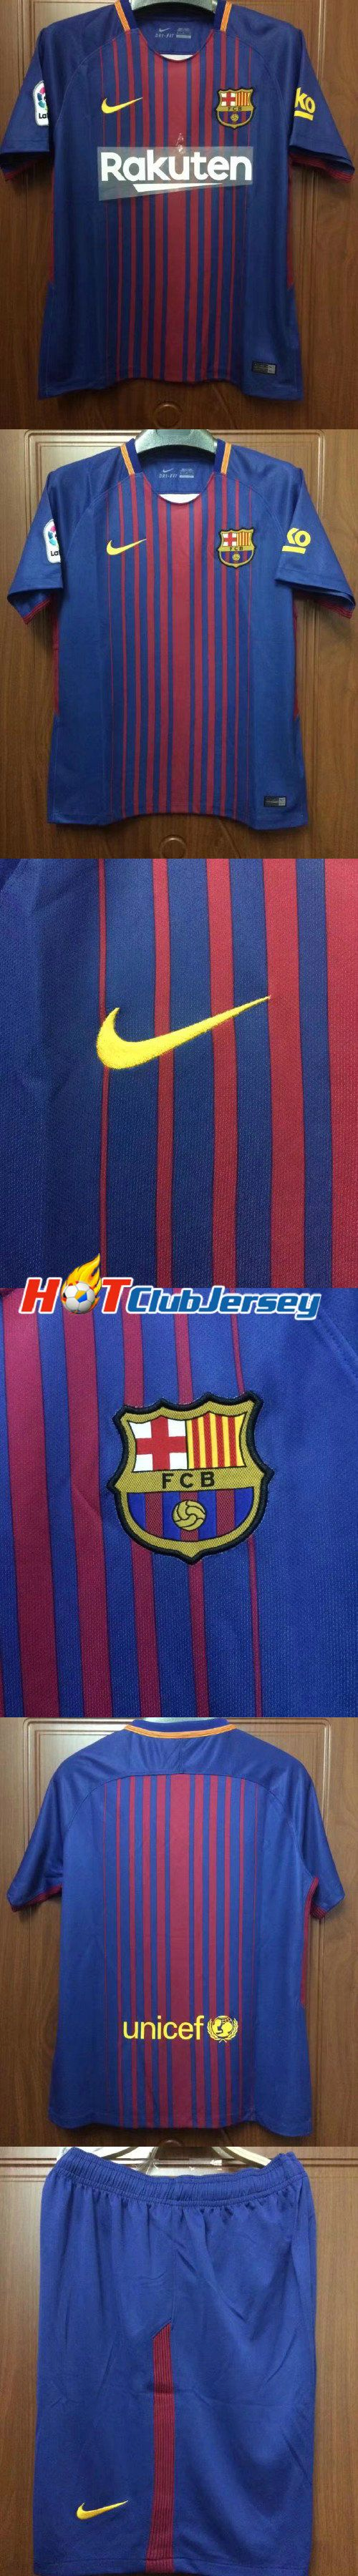 Barcelona  2017 18  Messi Soccer Jersey SUAREZ Jerseys Camisas Purple Neymar  INIESTA PIQUE Camiseta de futbol Cheap Soccer Jerseys www.hotclubjerseys.com